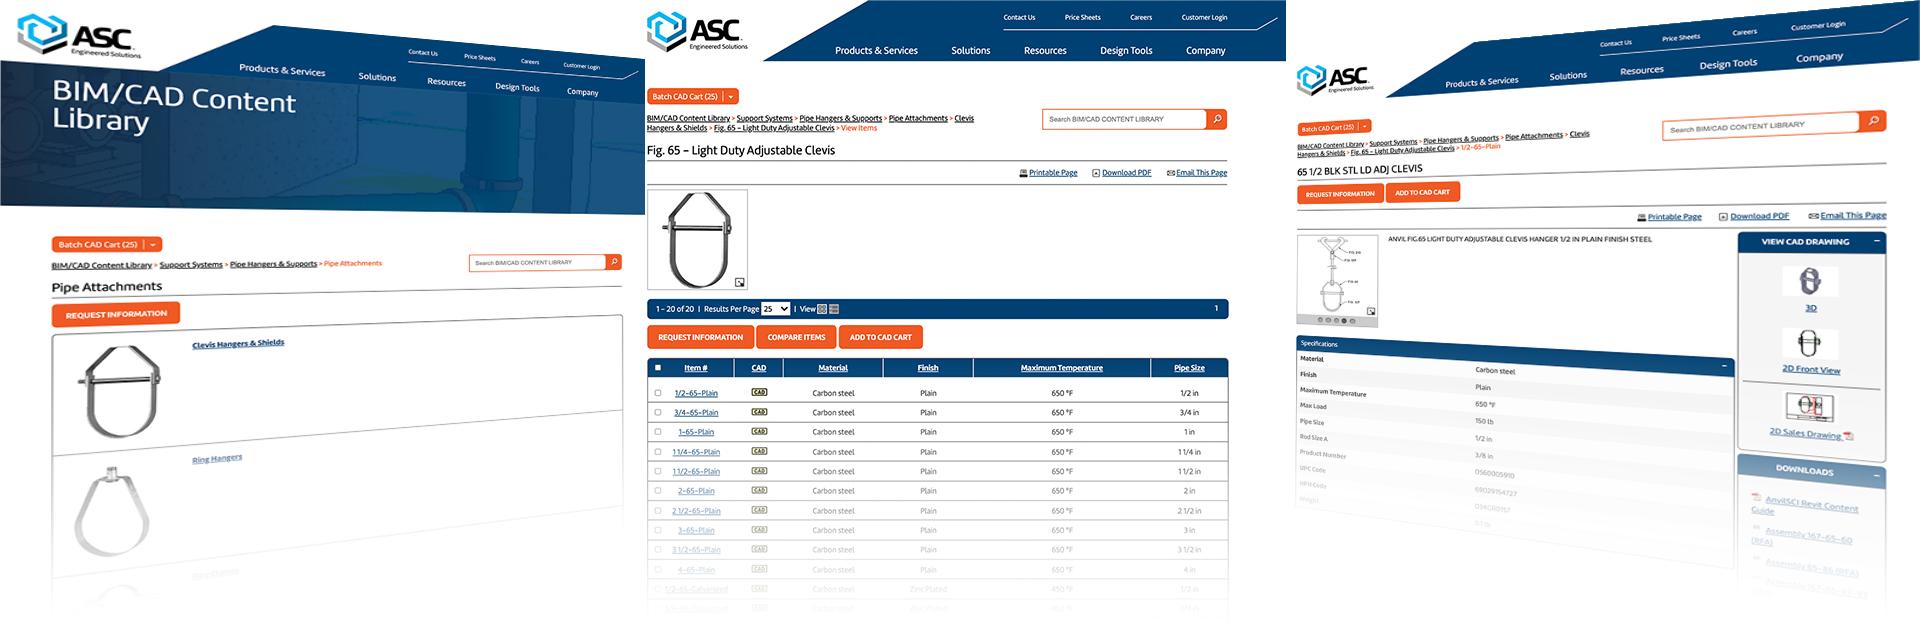 ASC Engineered Solutions Digital Customer Experience